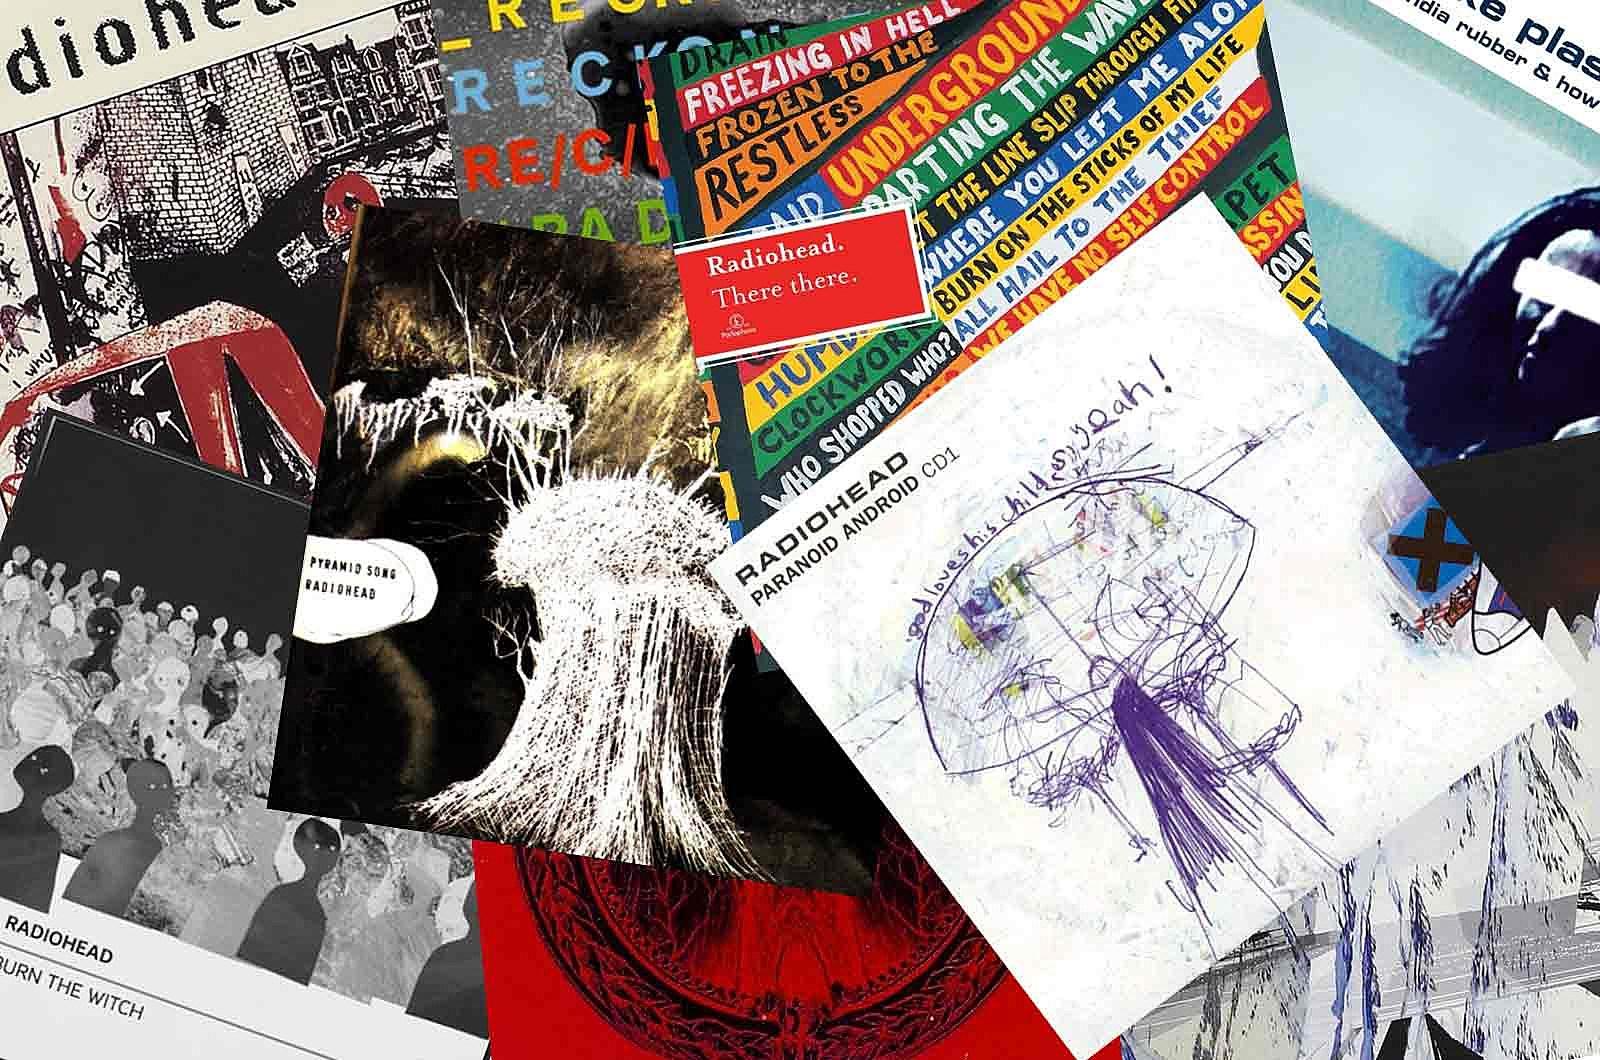 radiohead creep cover mp3 download